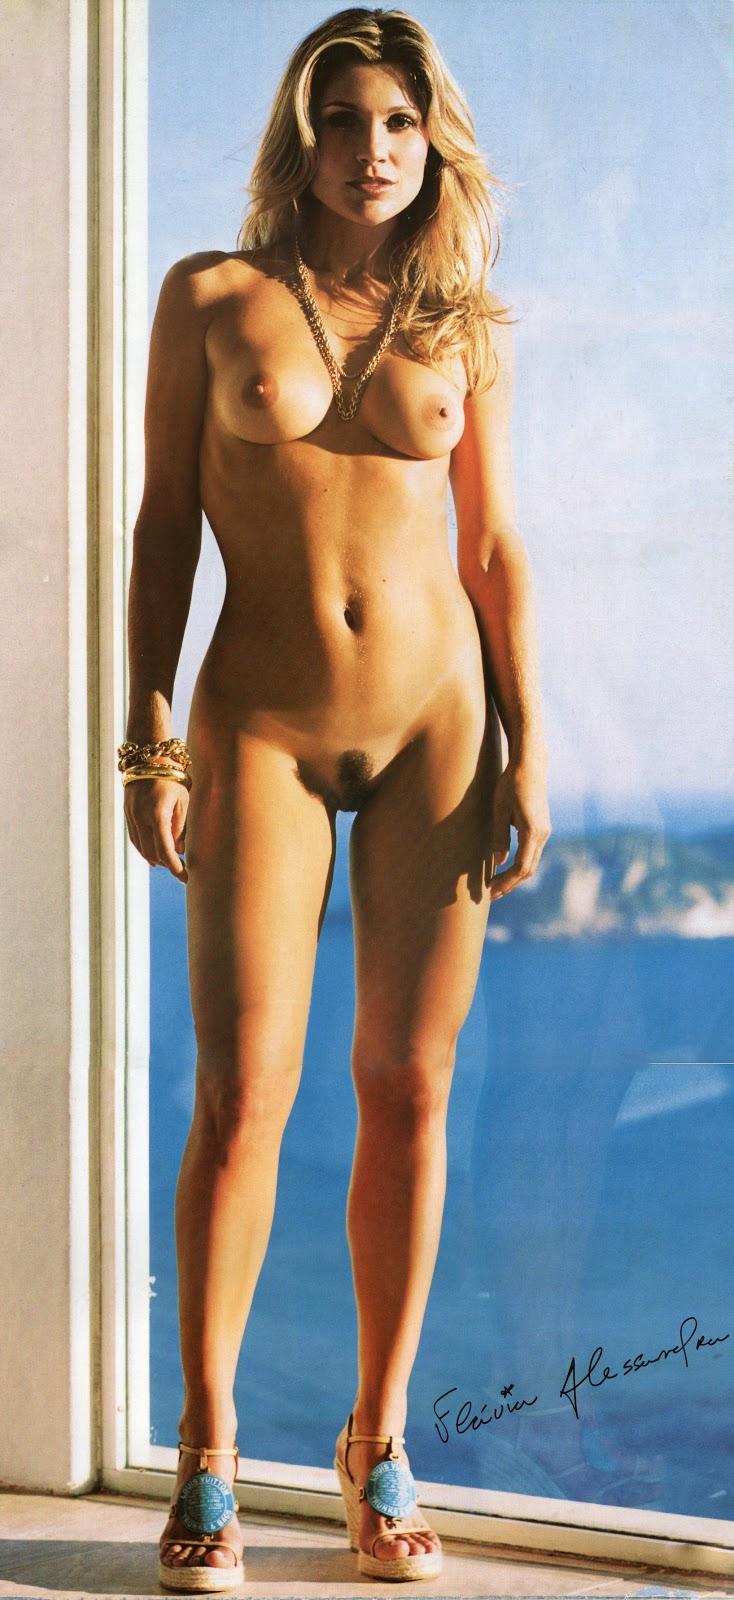 Flavia Playboy portallsx - images and wallpapers: flavia alessandra